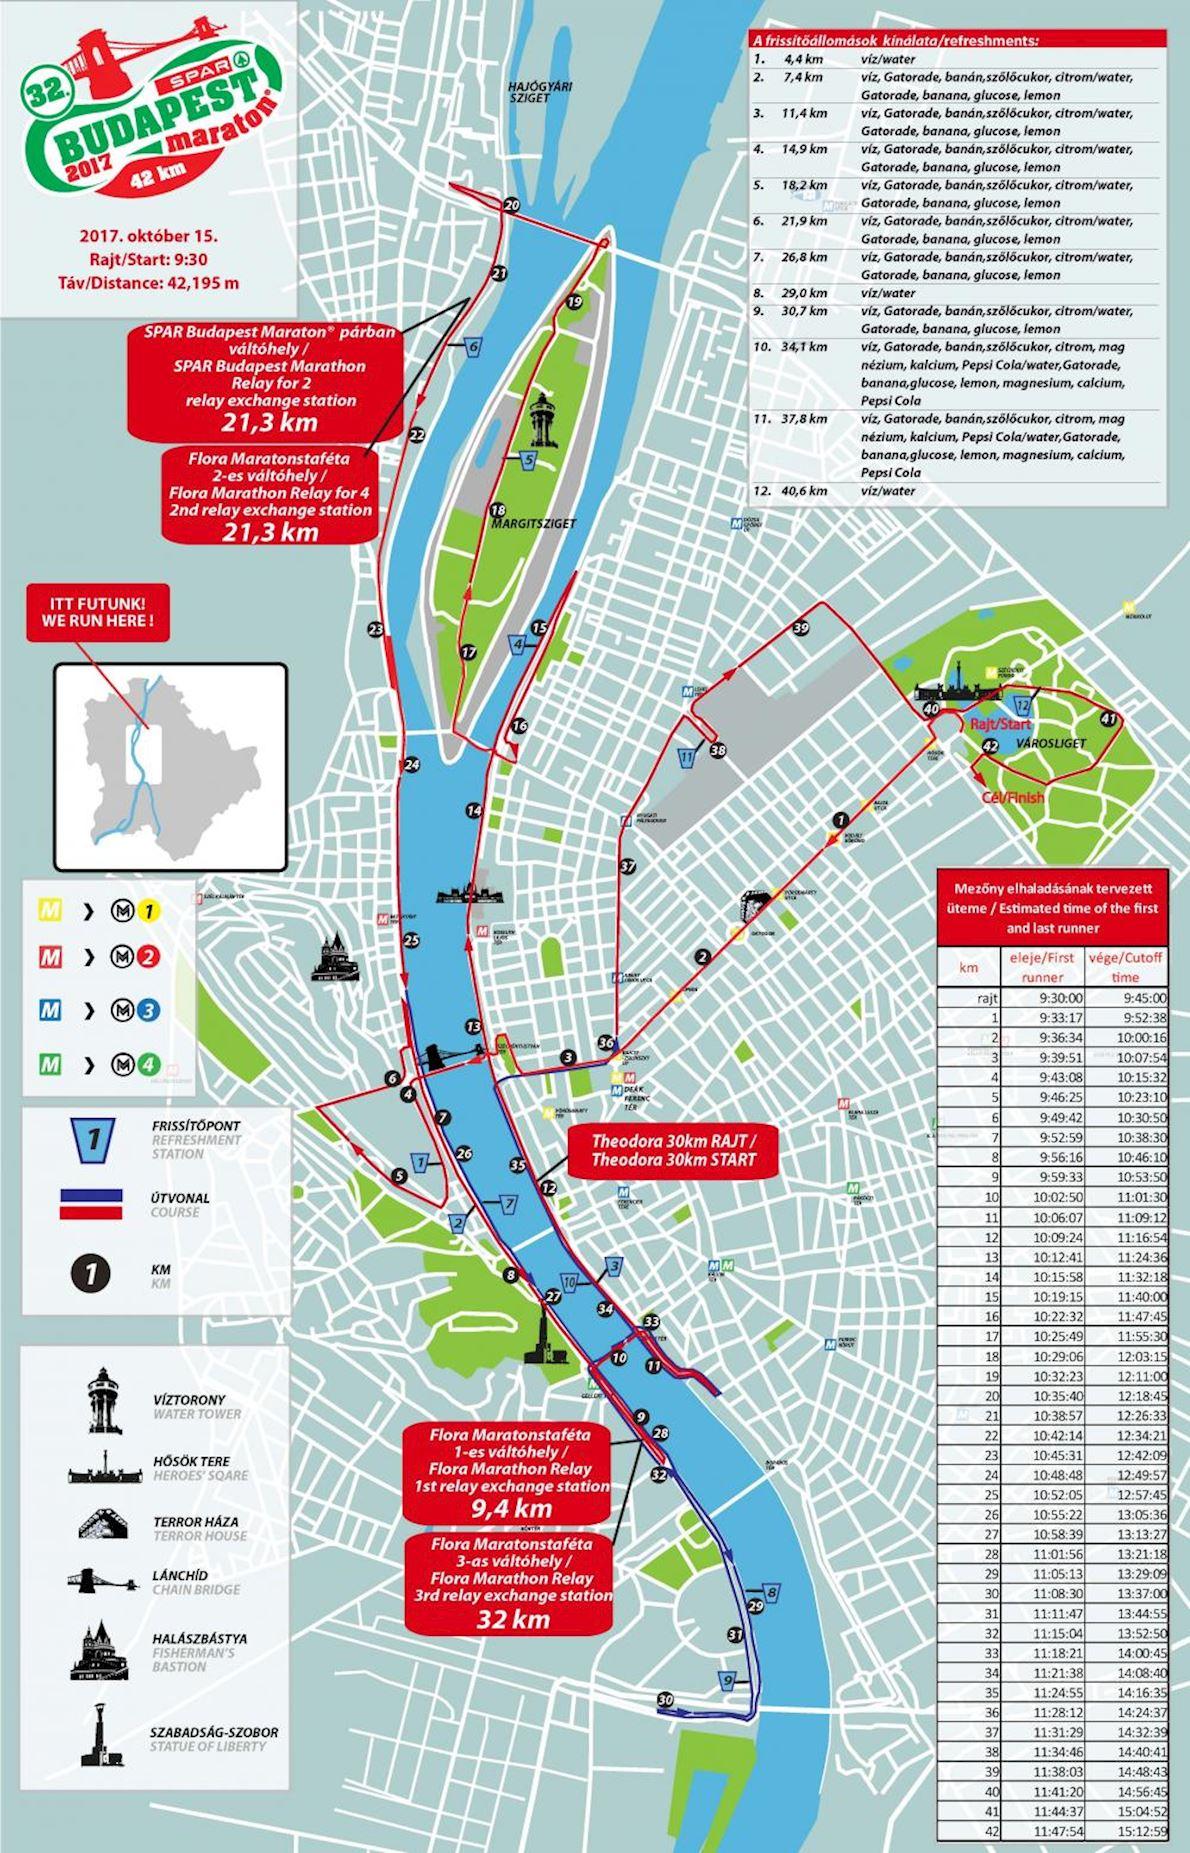 Budapest Marathon 路线图